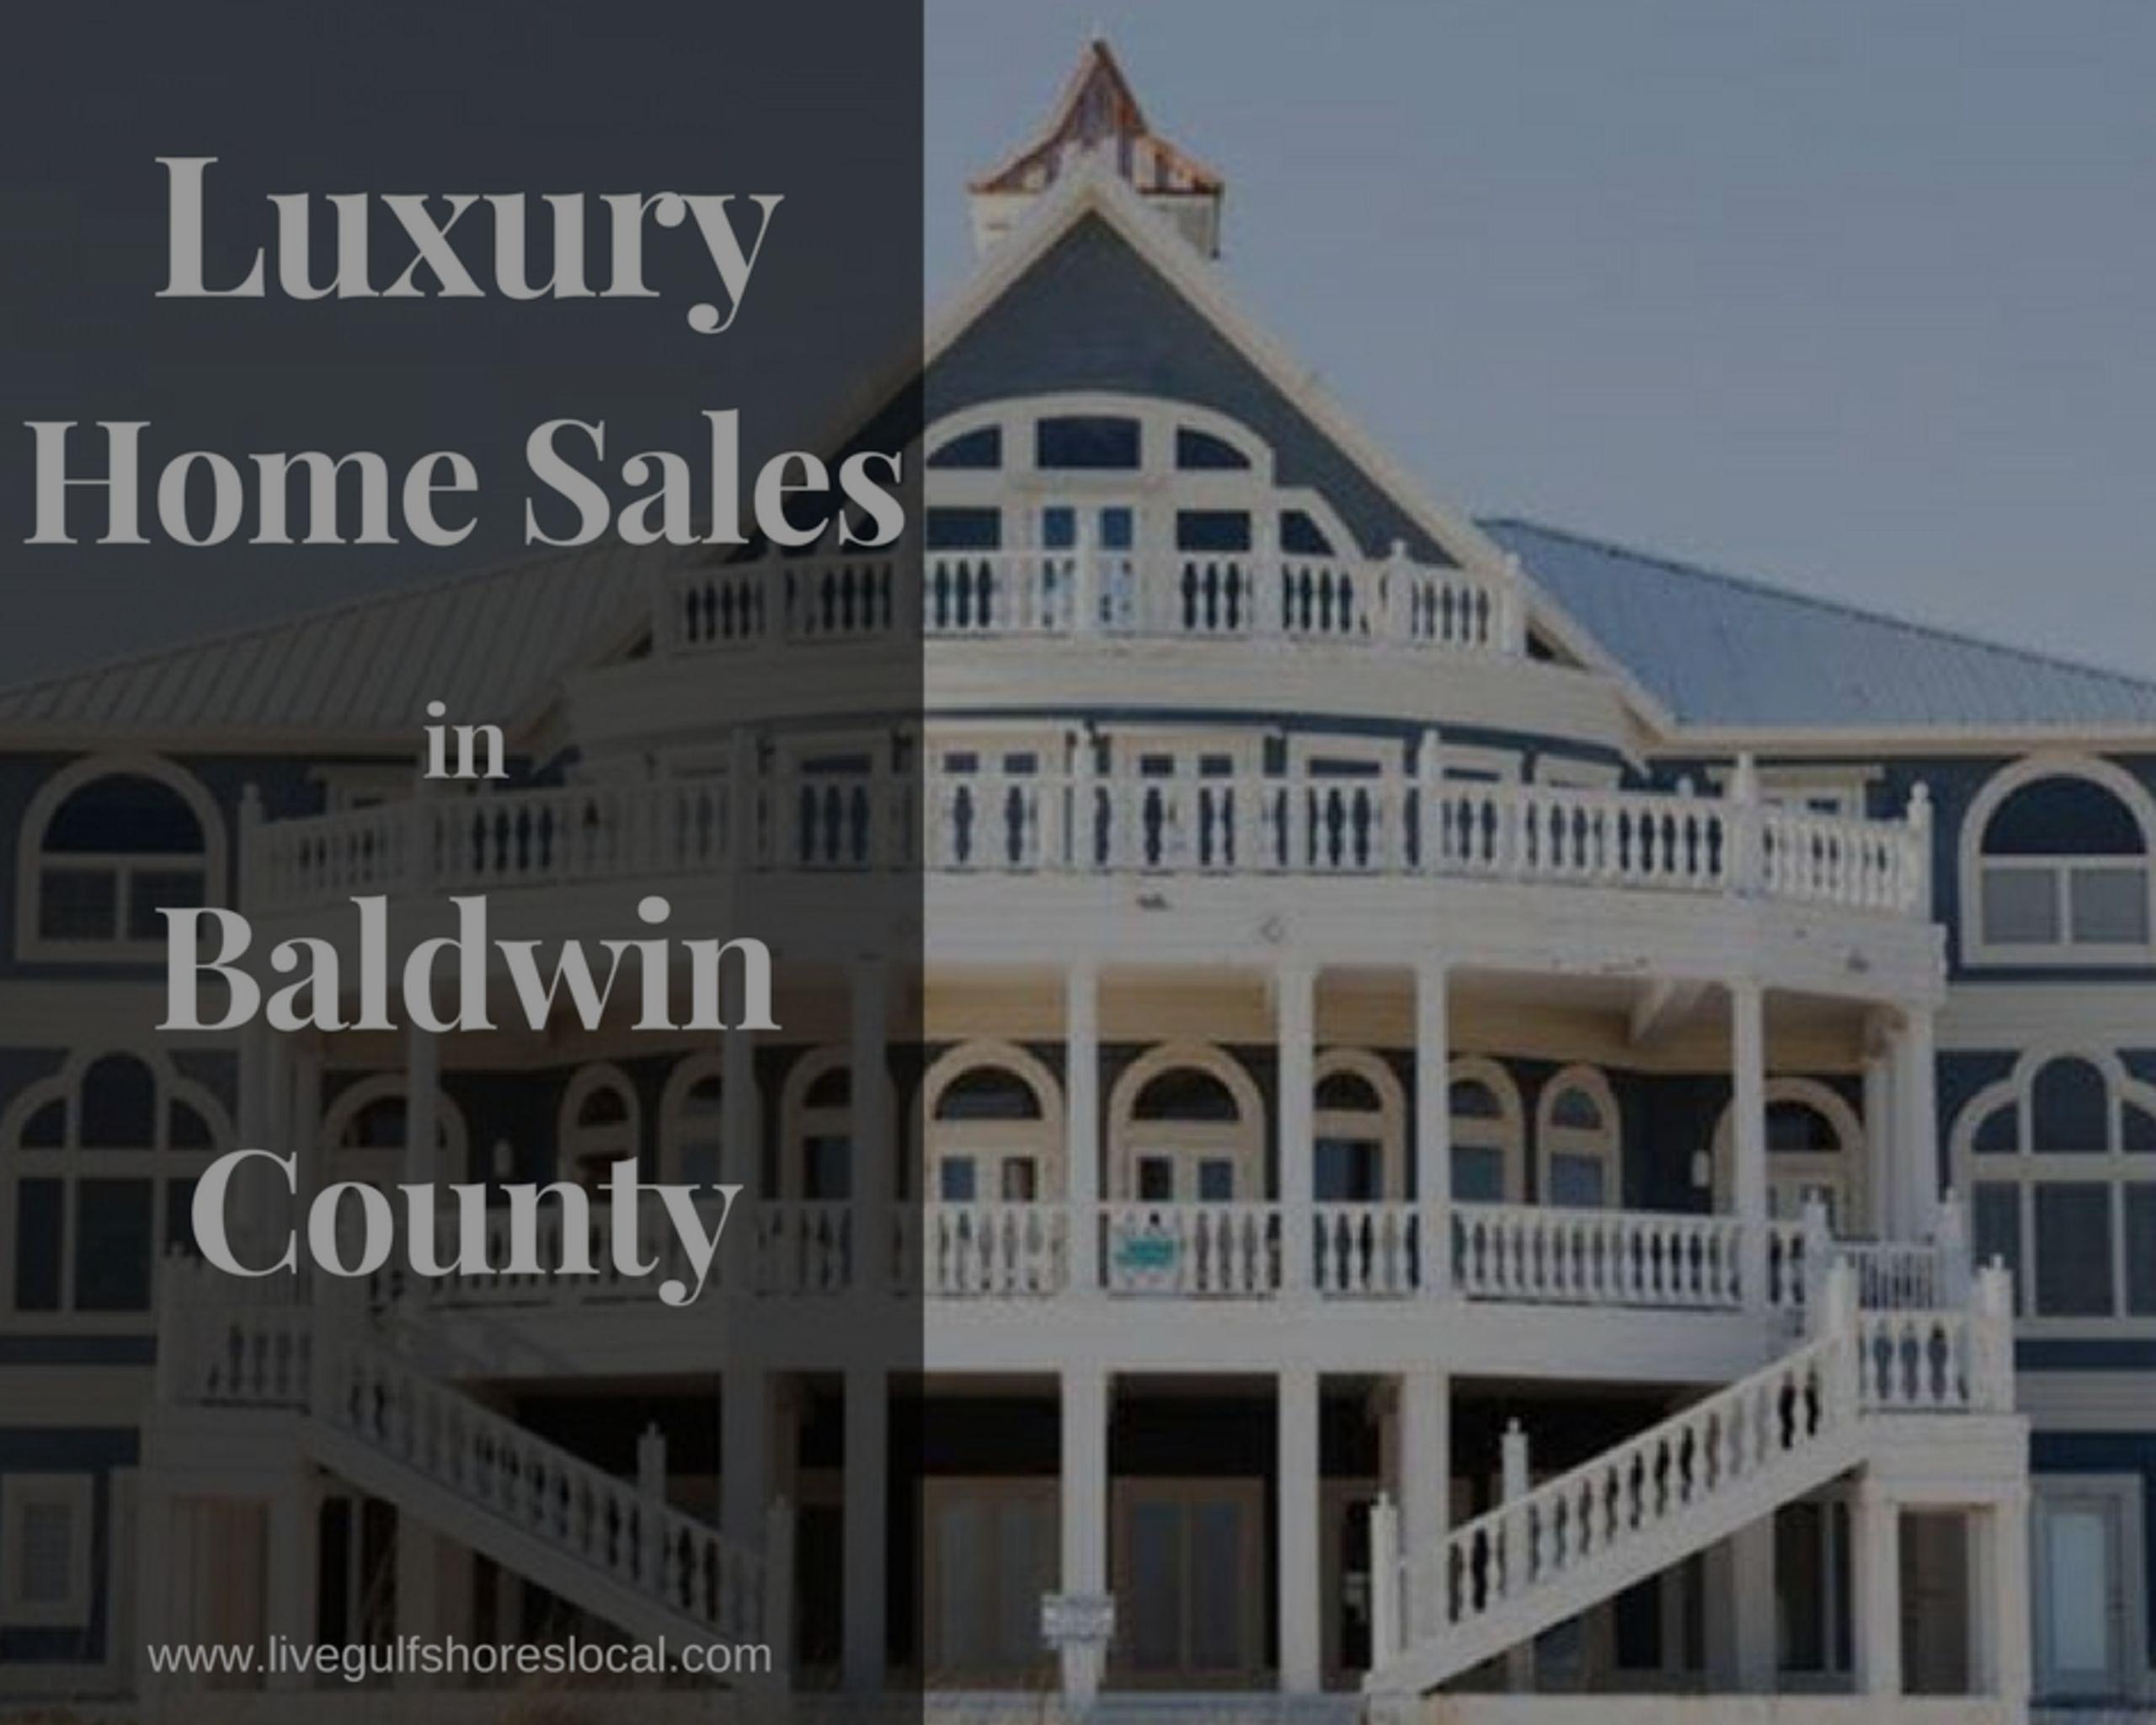 Luxury Home Sales in Baldwin County – January 2018